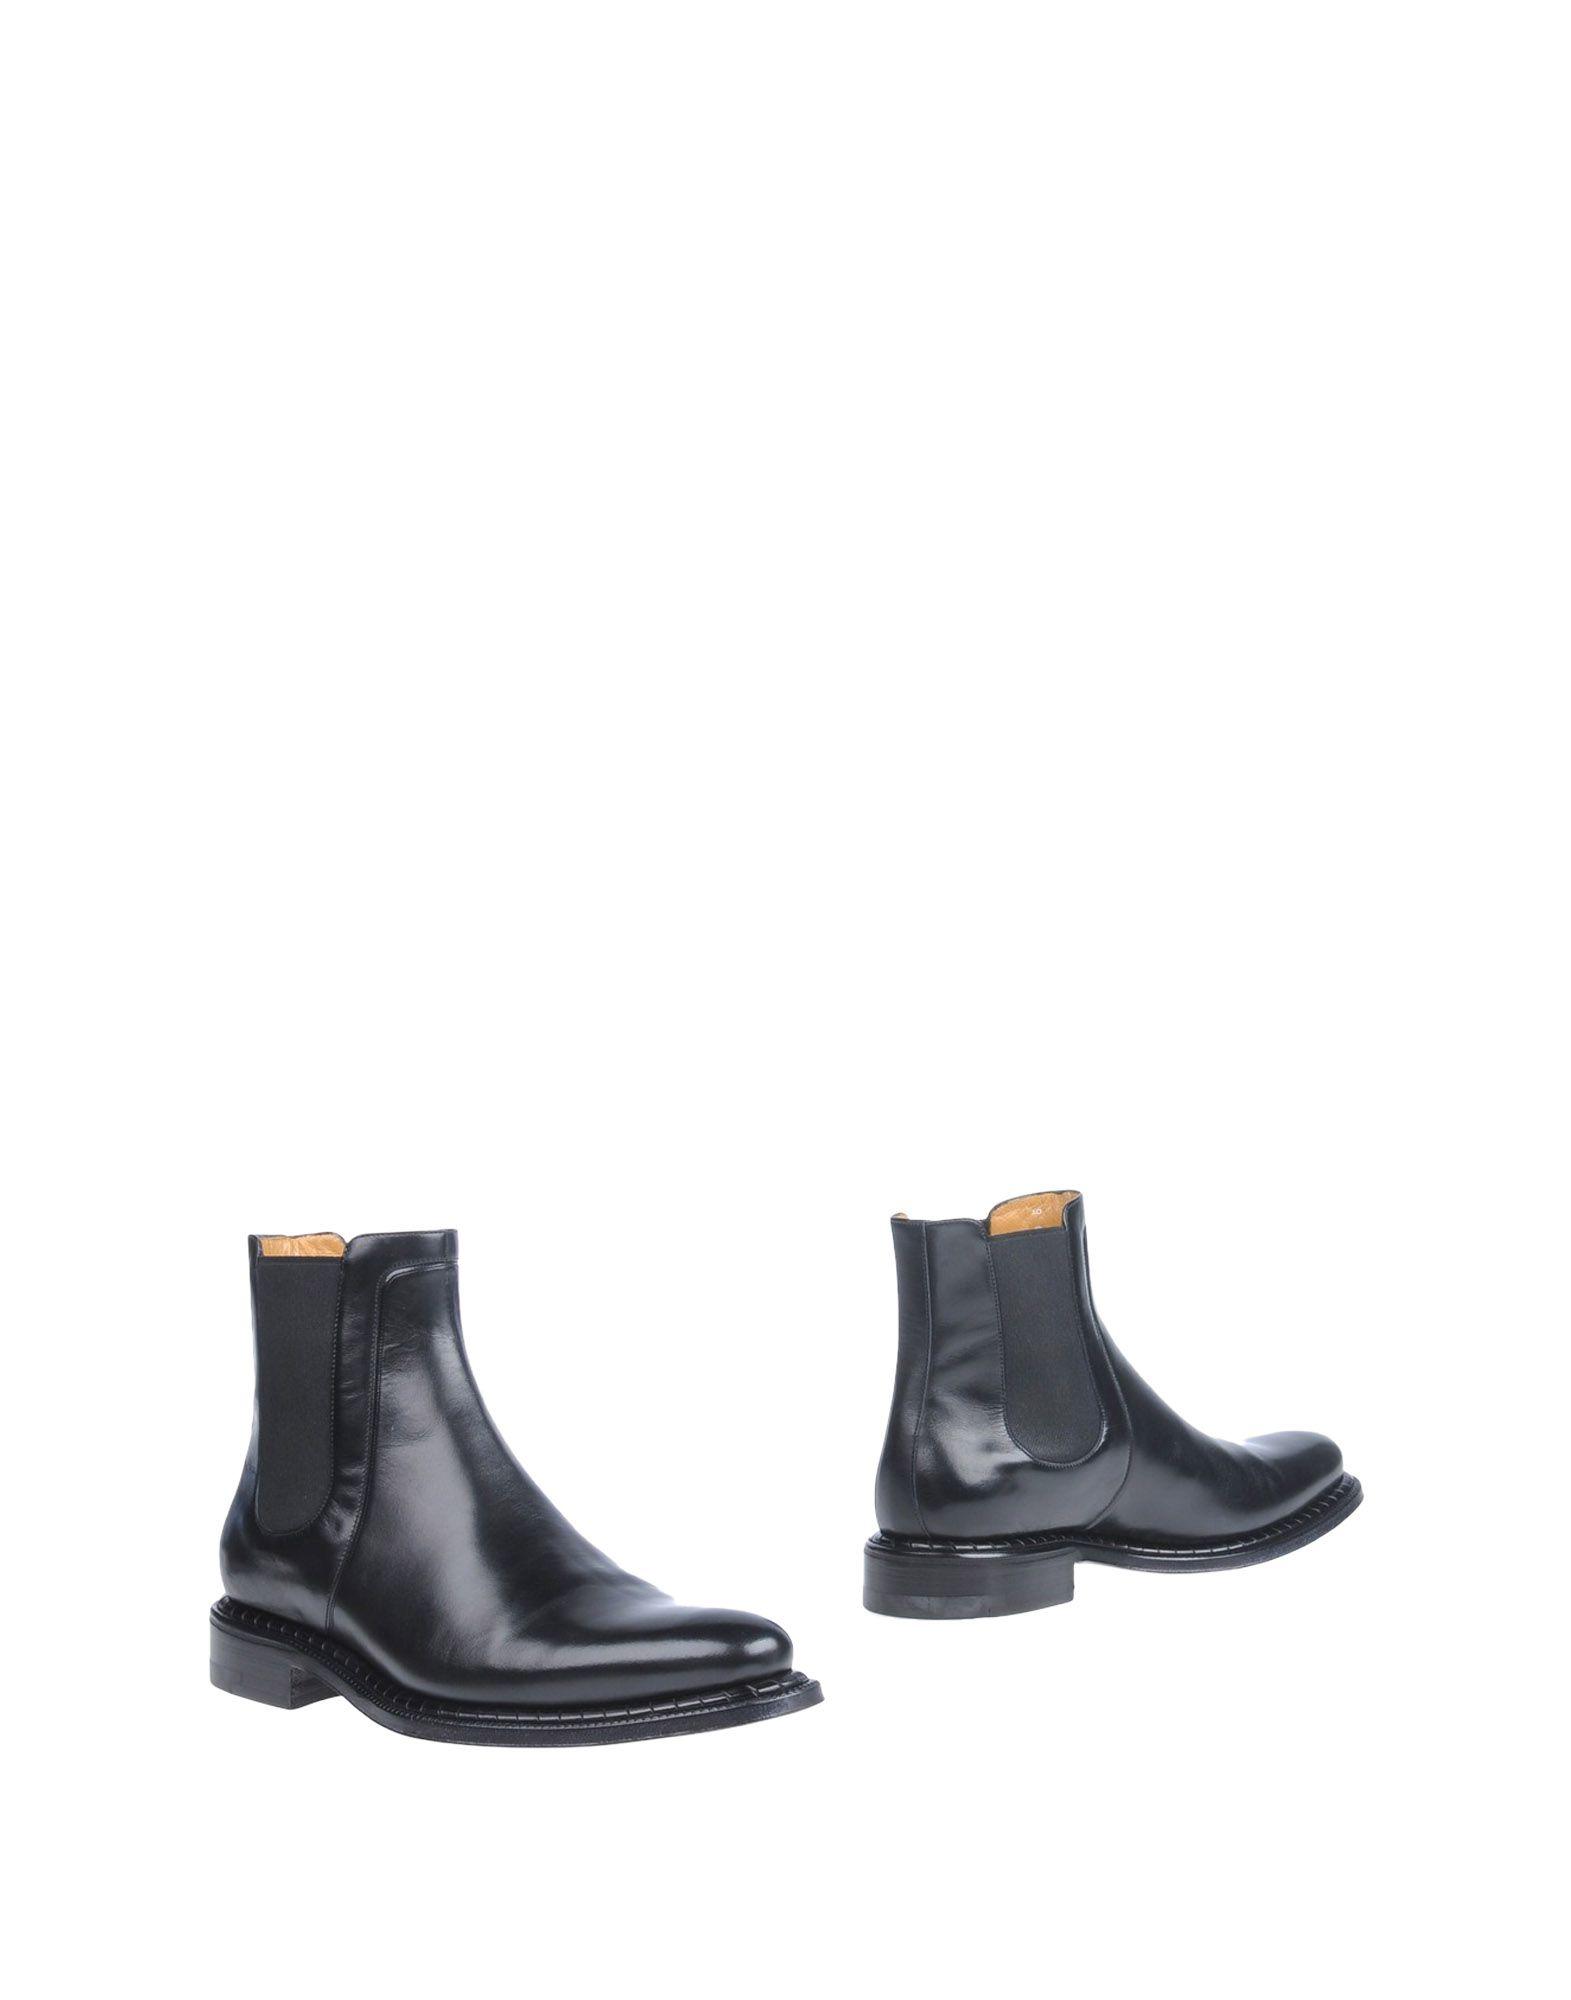 A.TESTONI Полусапоги и высокие ботинки magazzini del sale полусапоги и высокие ботинки